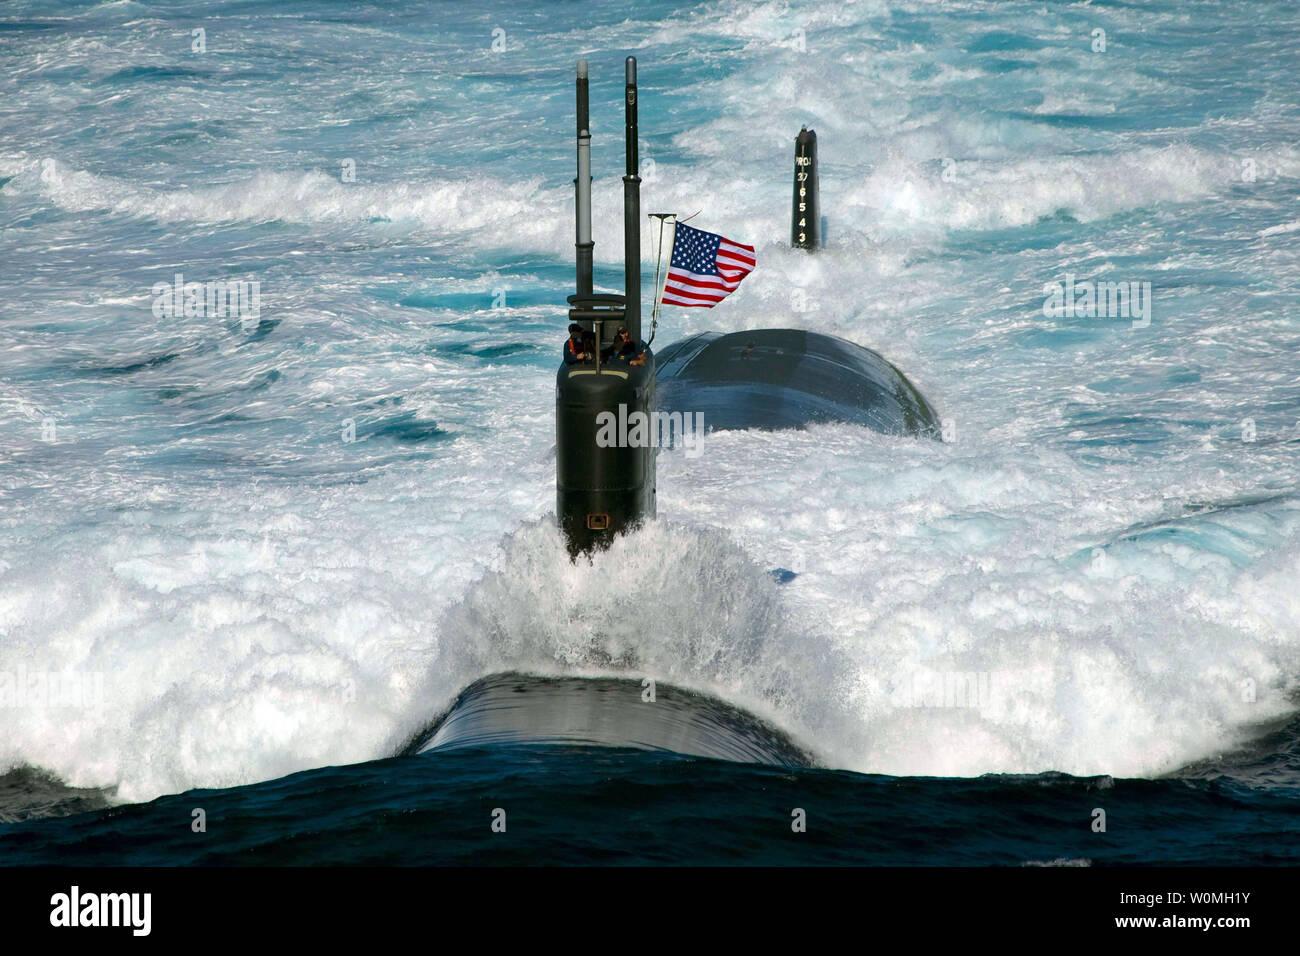 Attack Submarine Stock Photos & Attack Submarine Stock